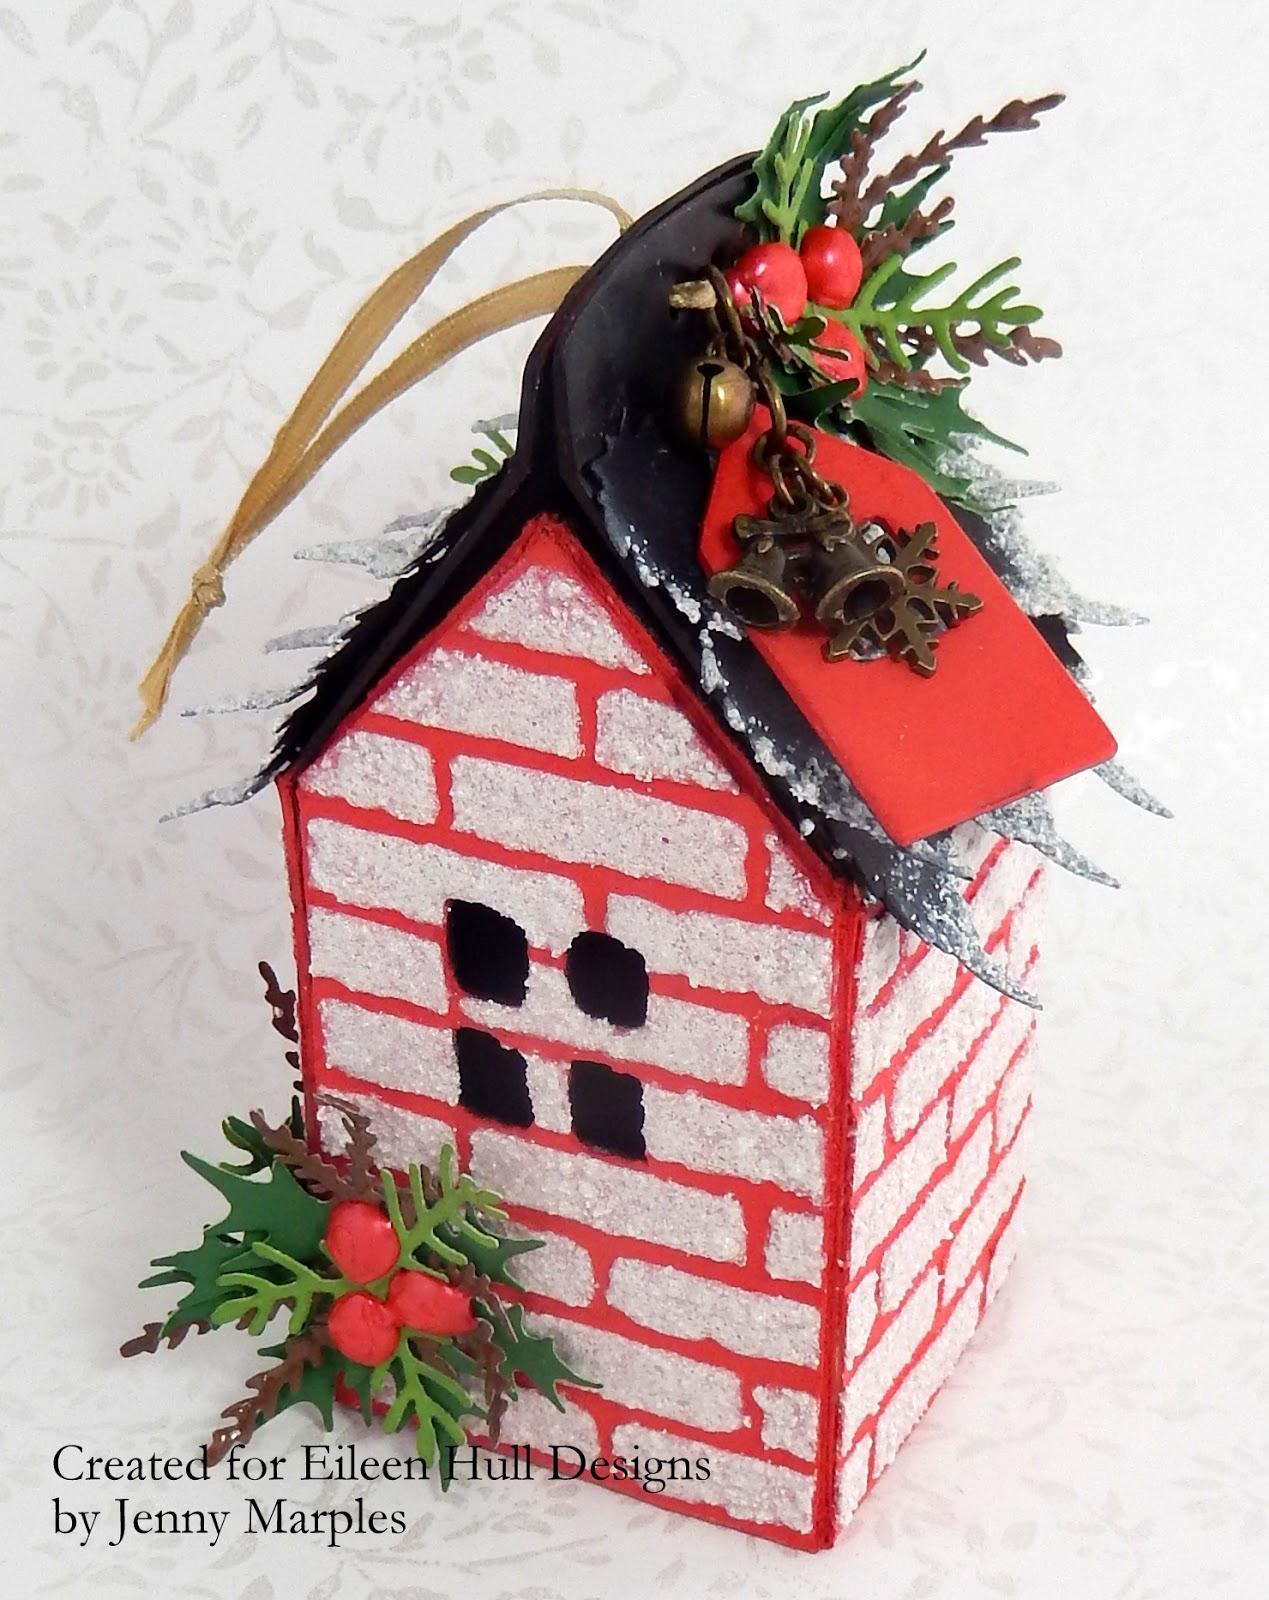 Sizzix House Ornament에 대한 이미지 검색결과